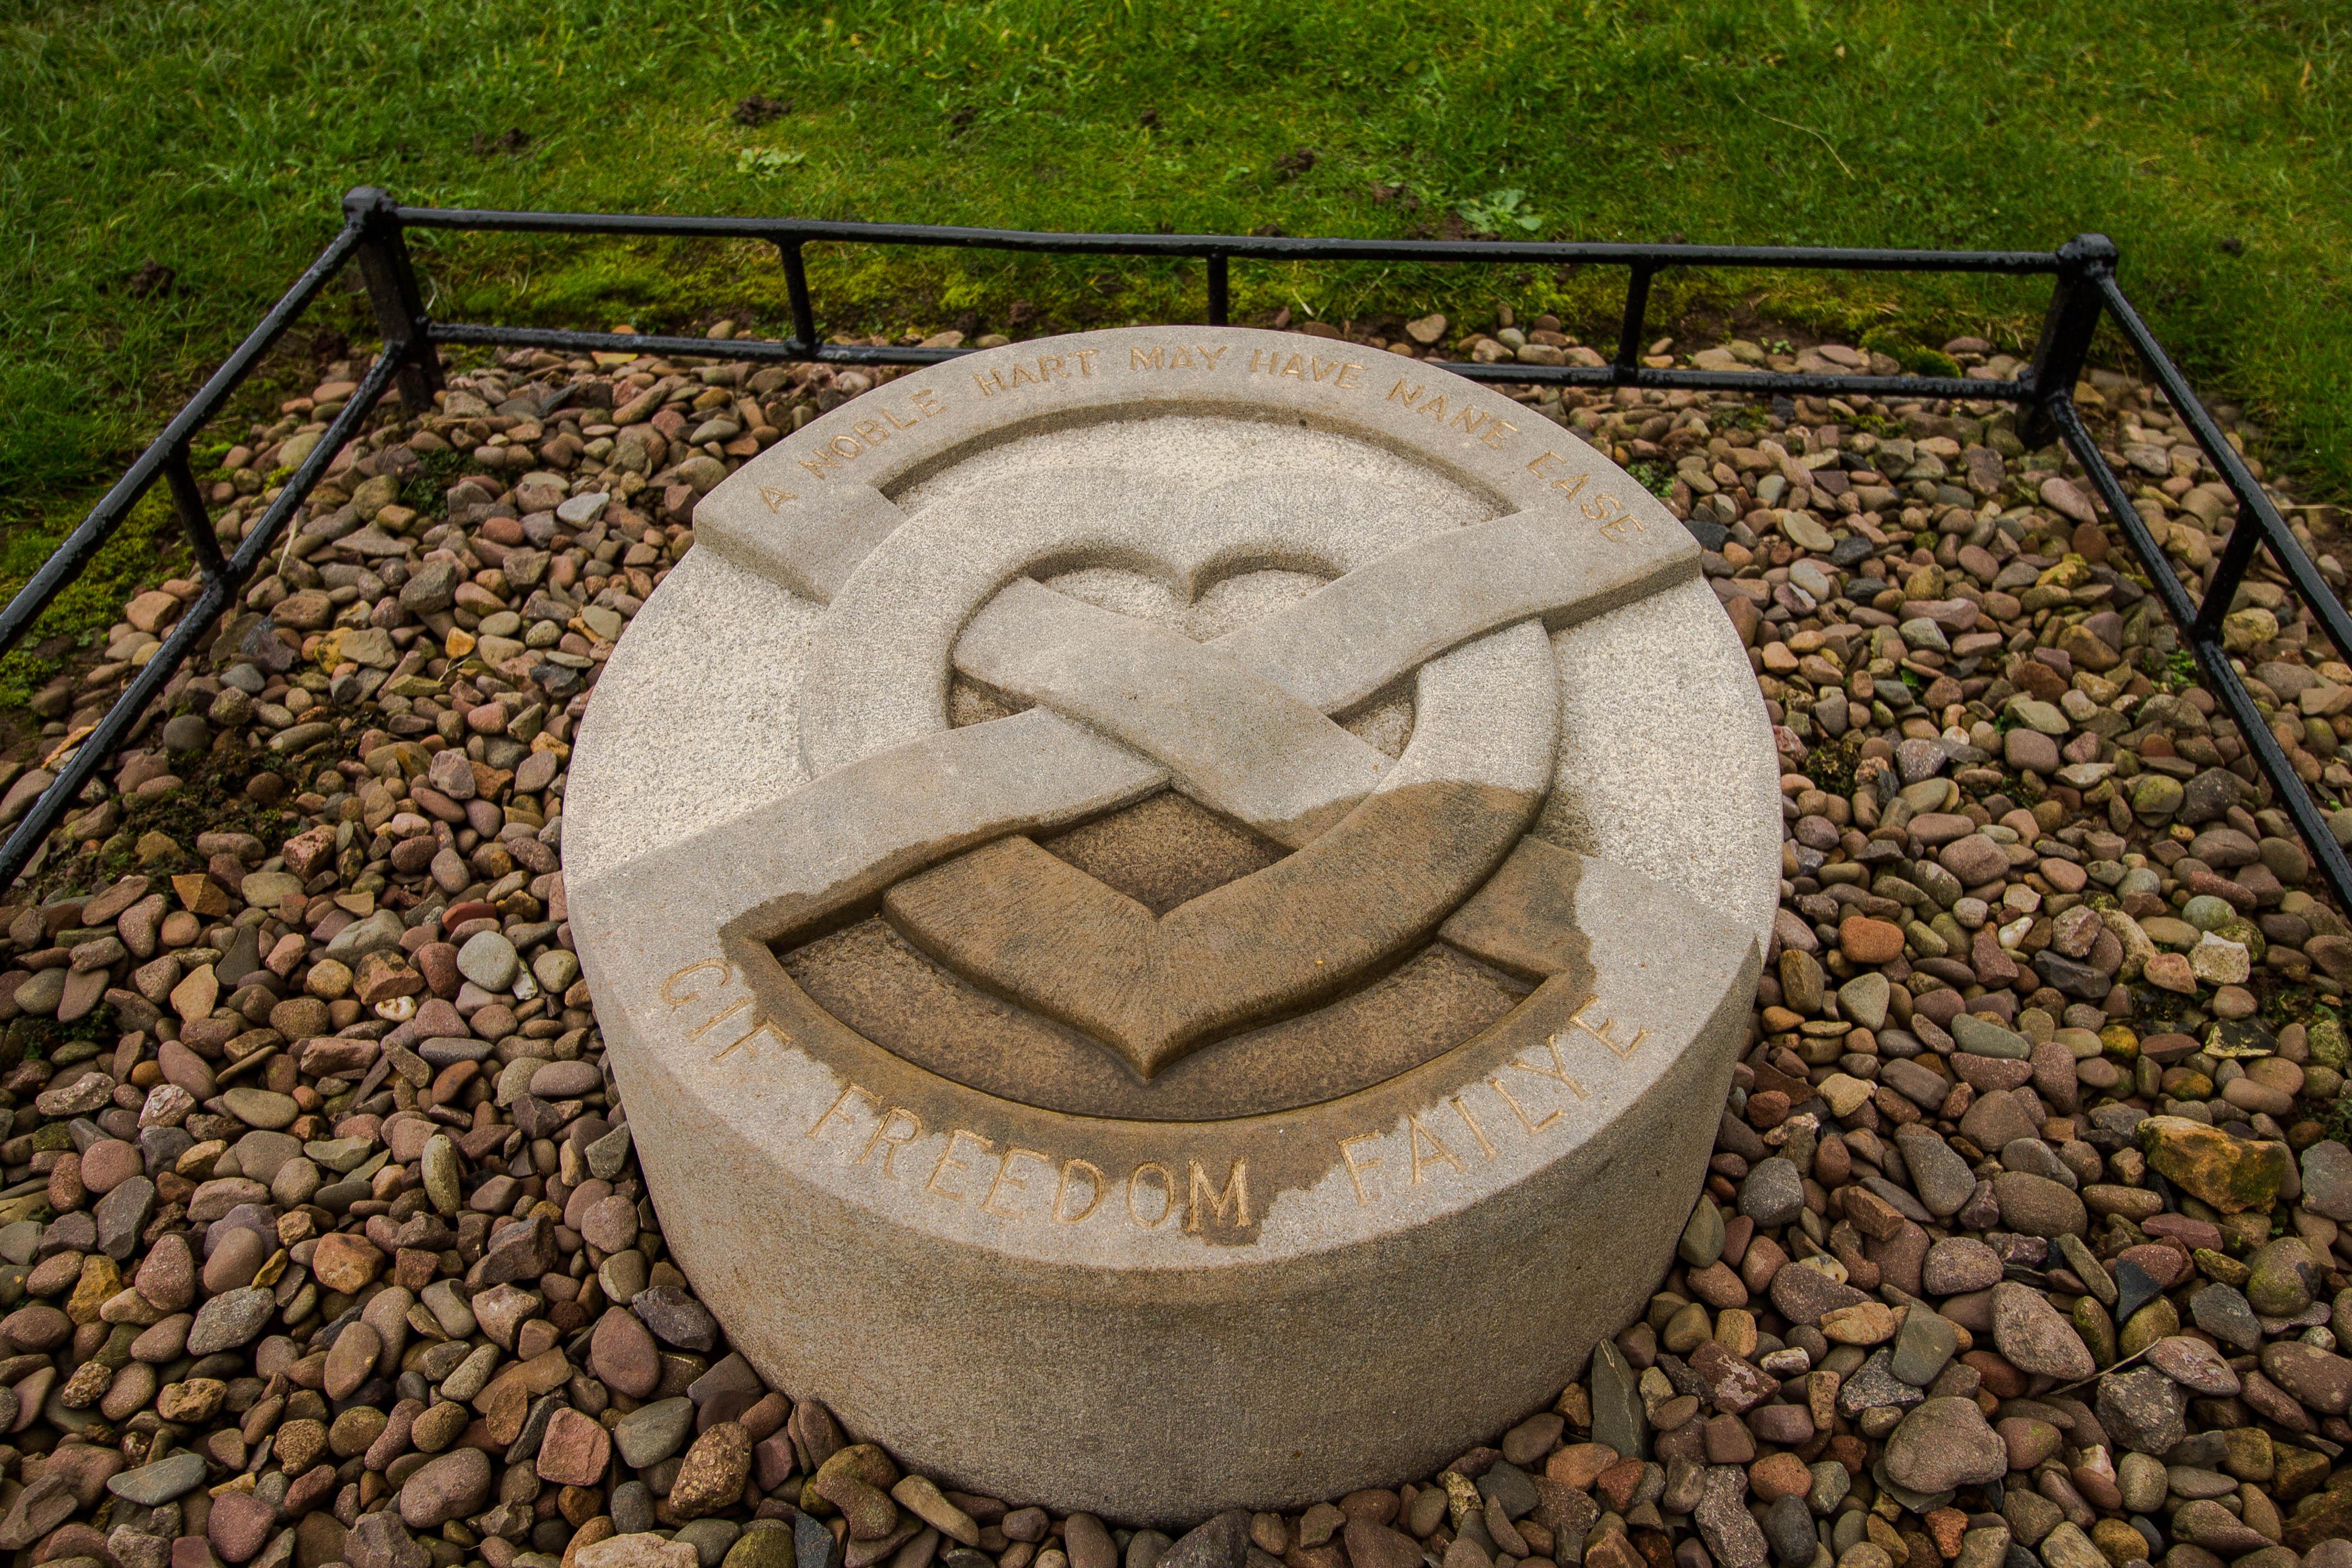 Melrose-Abbey-Robert-Bruce-Scozia-BeatriceRoat